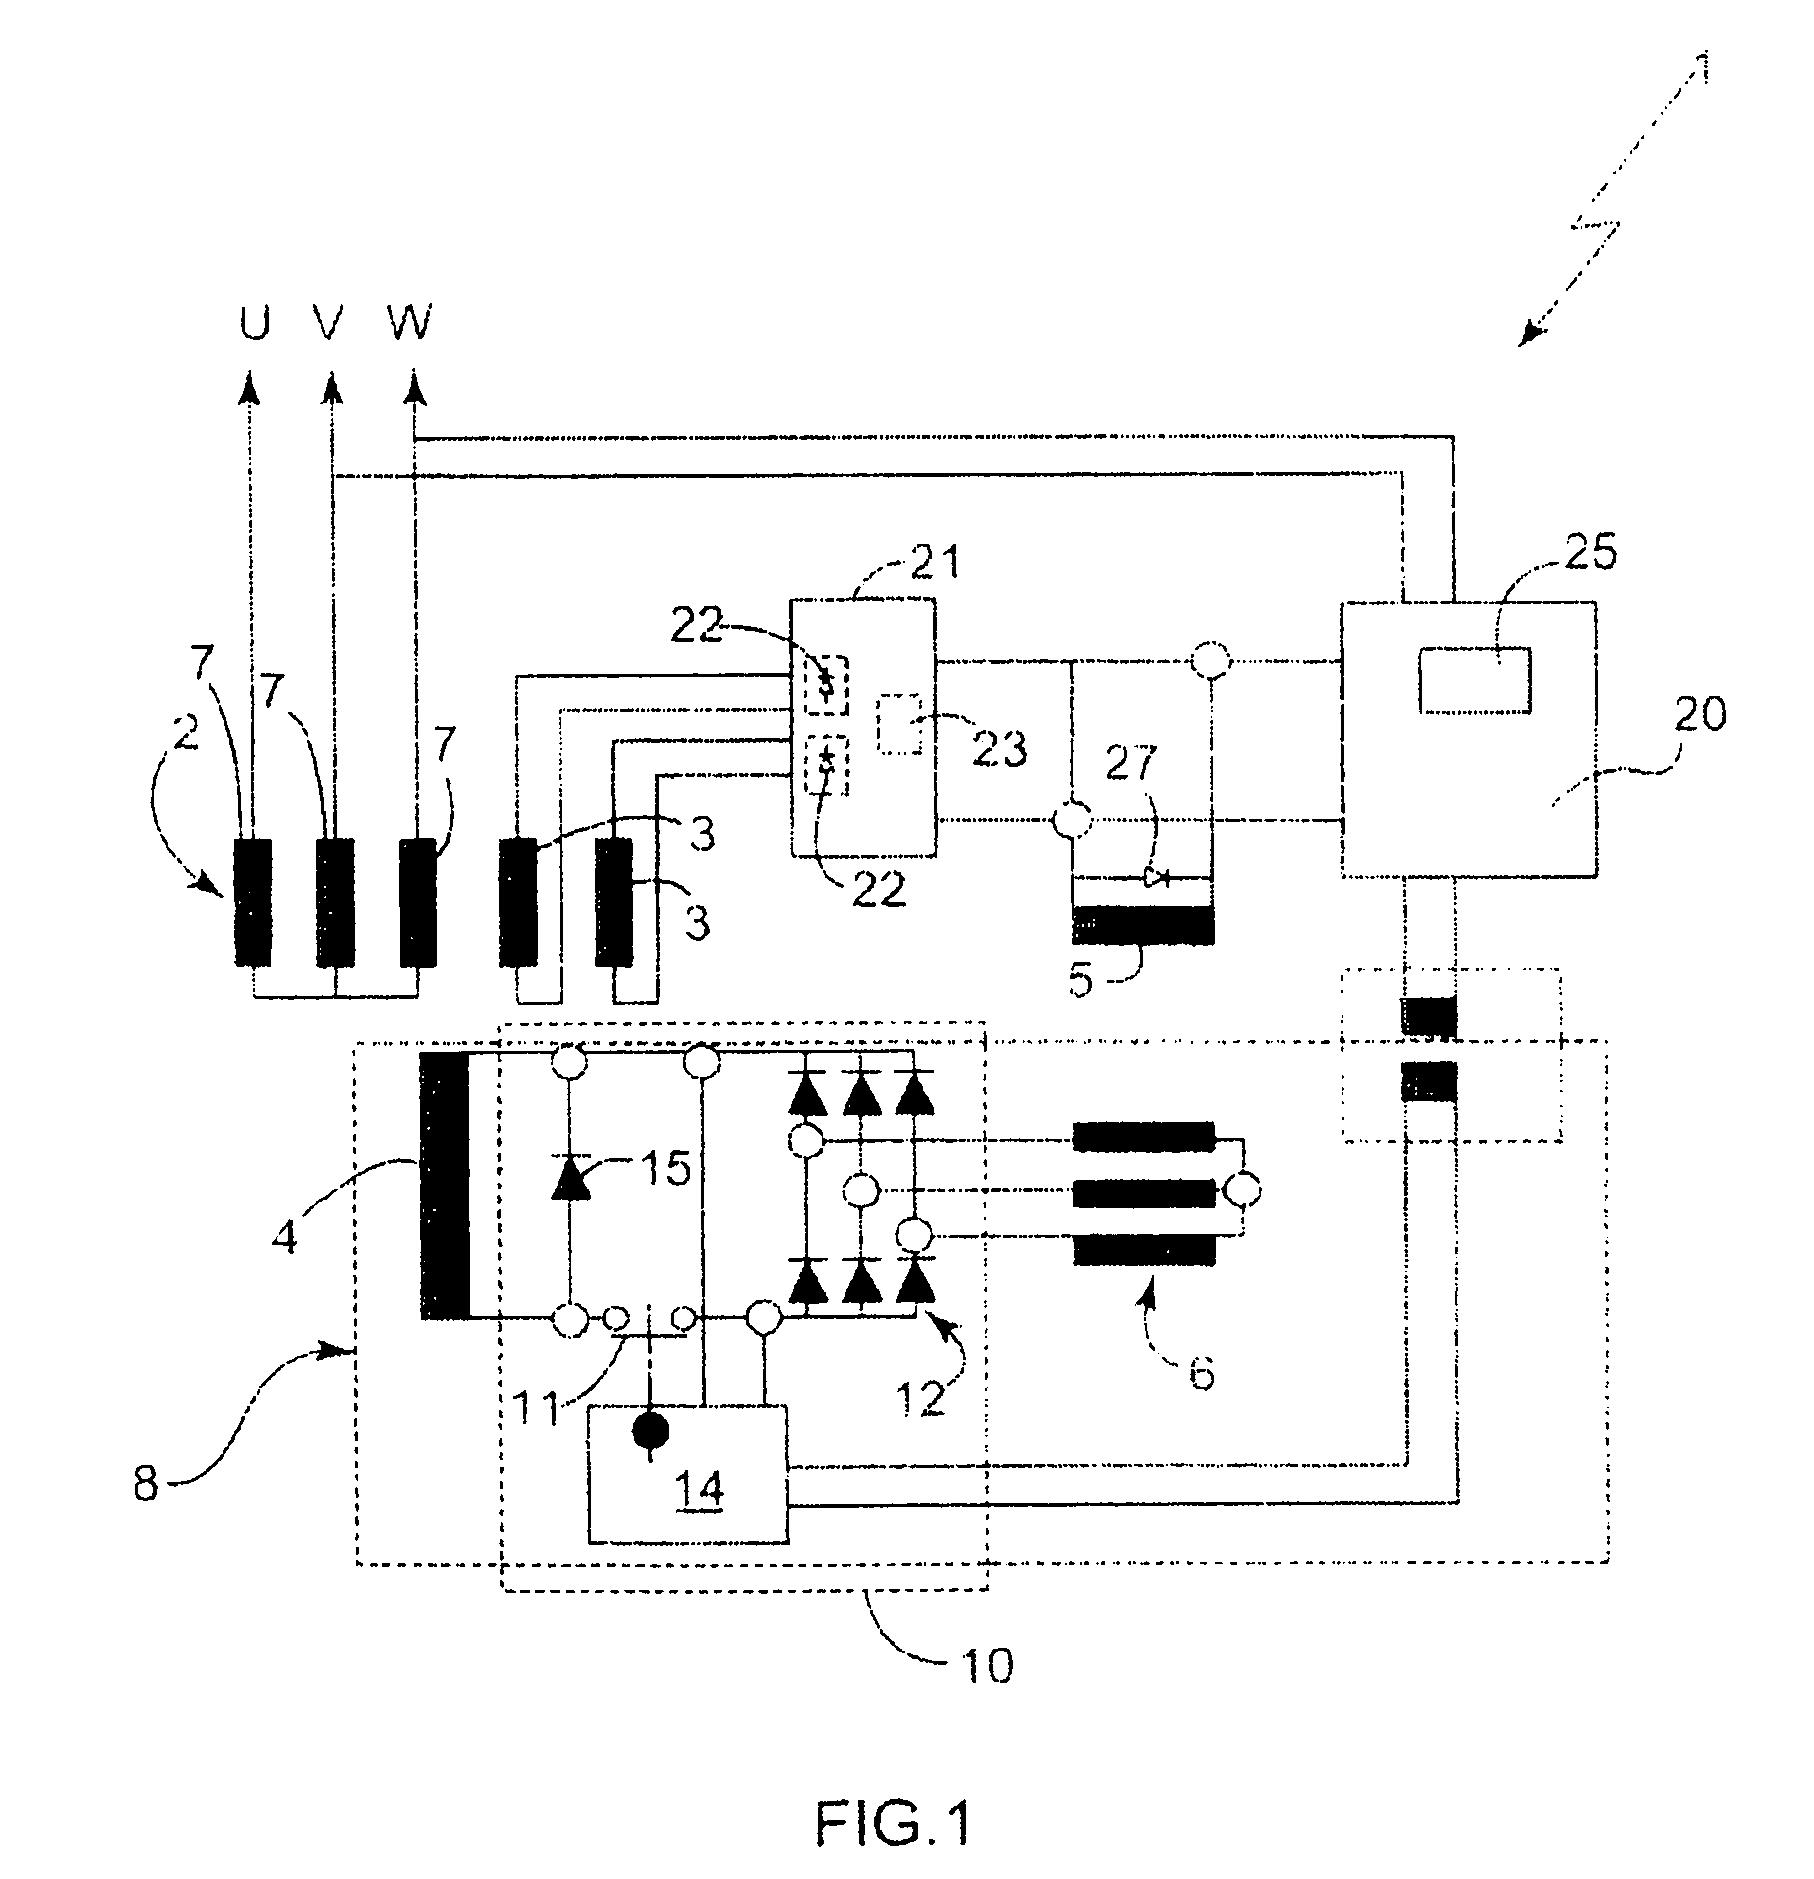 3 phase generator alternator wiring diagram corrosion cell patent us8013578 google patents